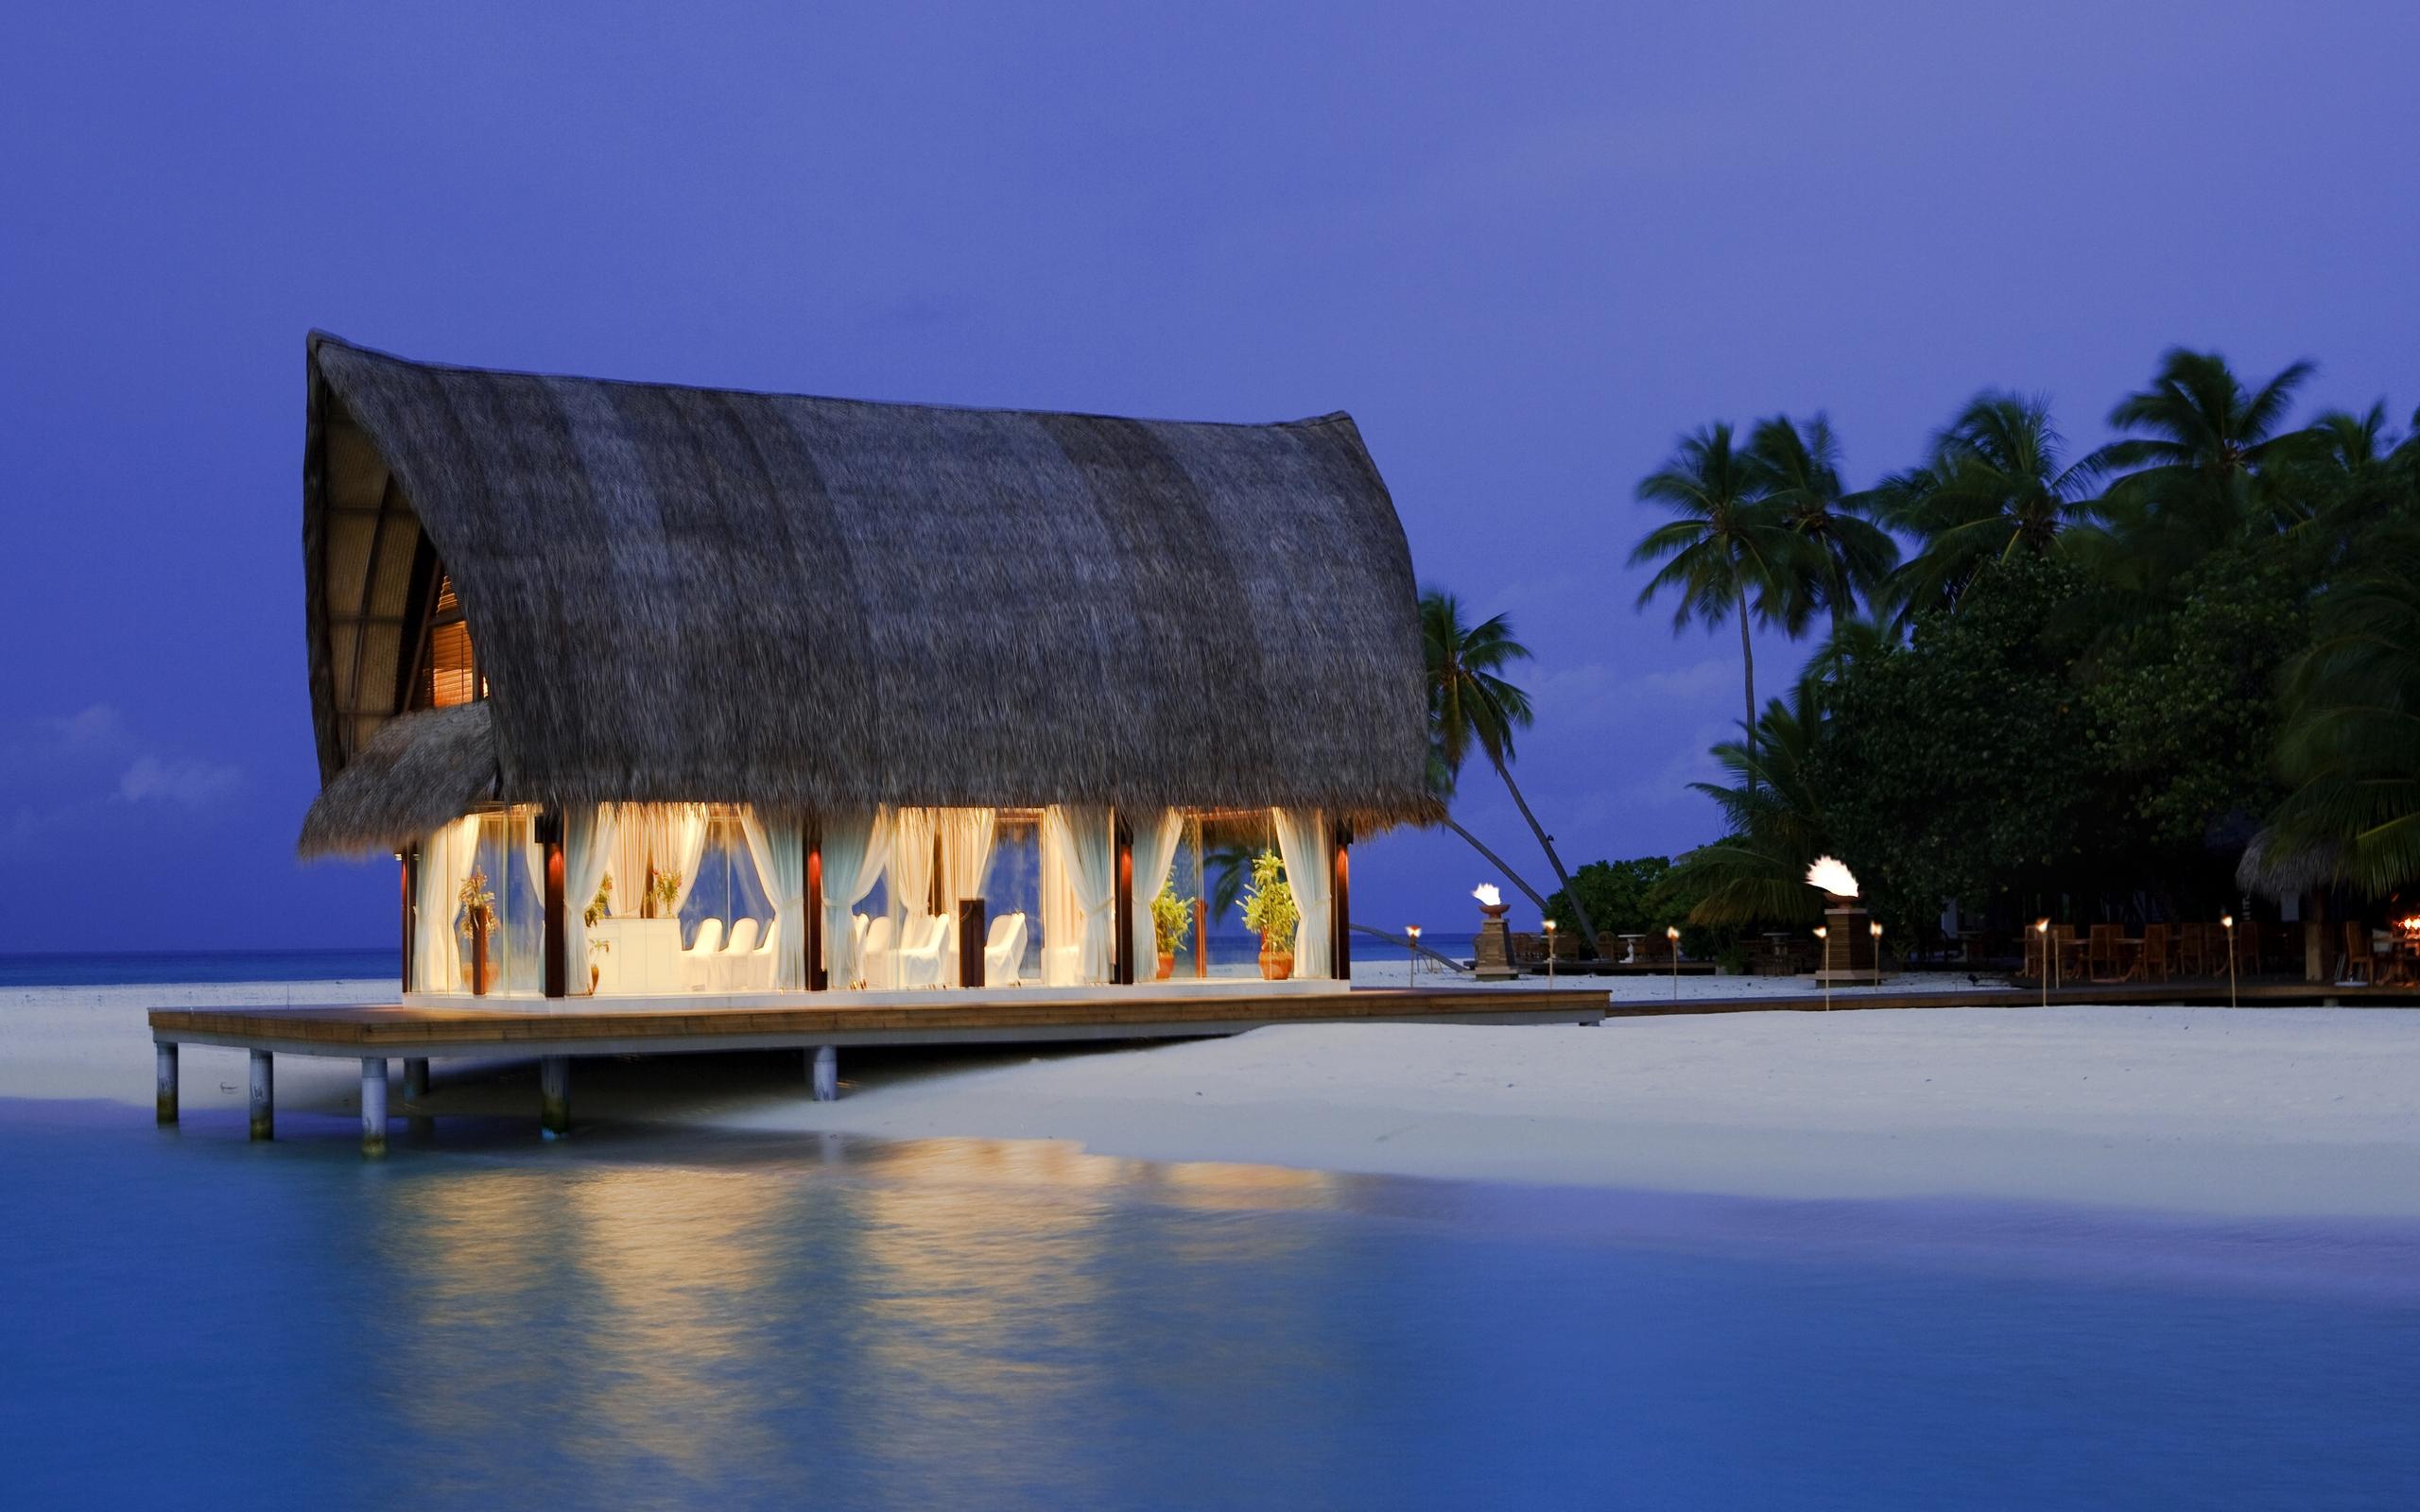 Maldive Islands Wallpapers   Best Wallpapers